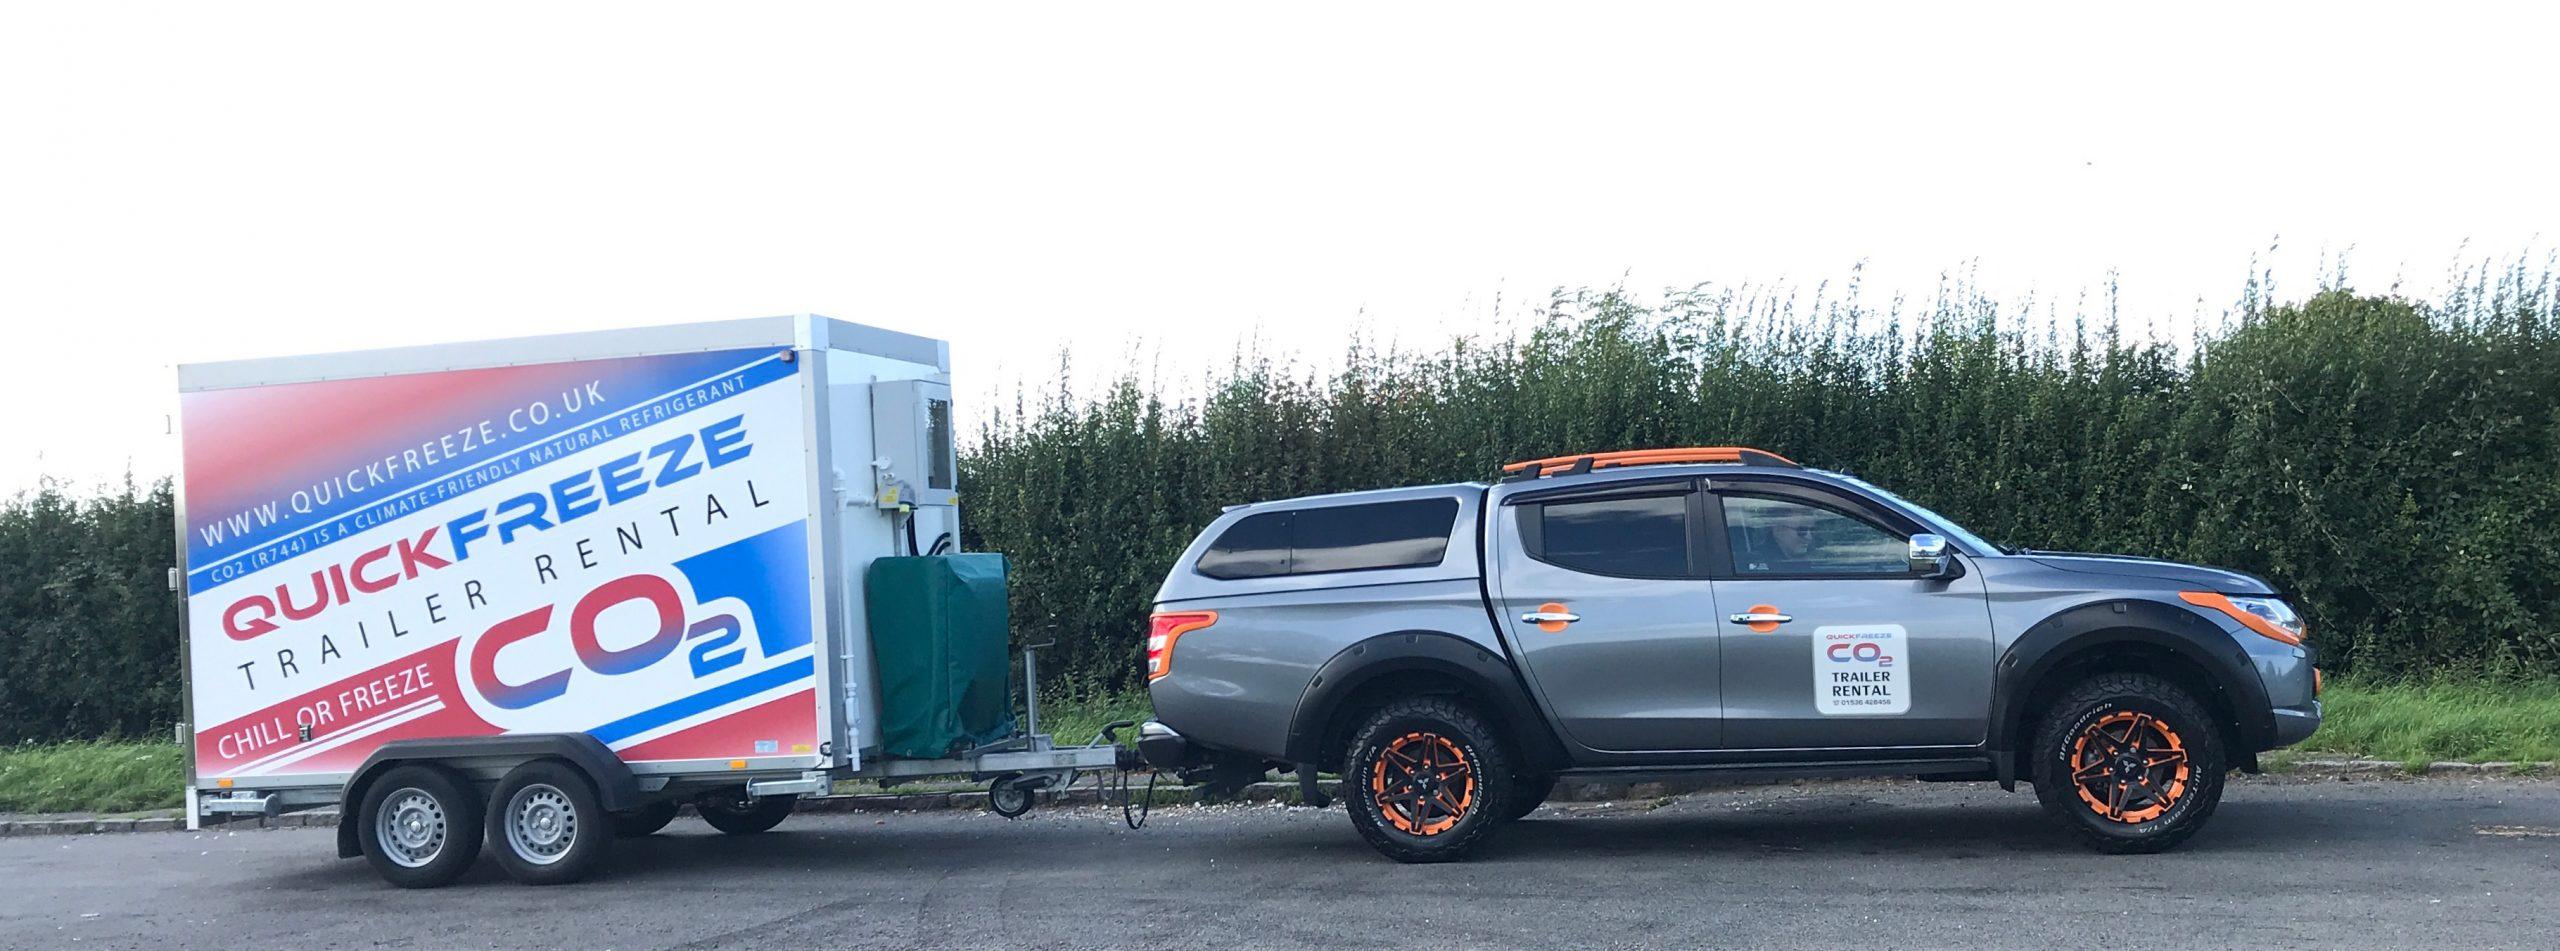 Quickfreeze smaller trailer and car